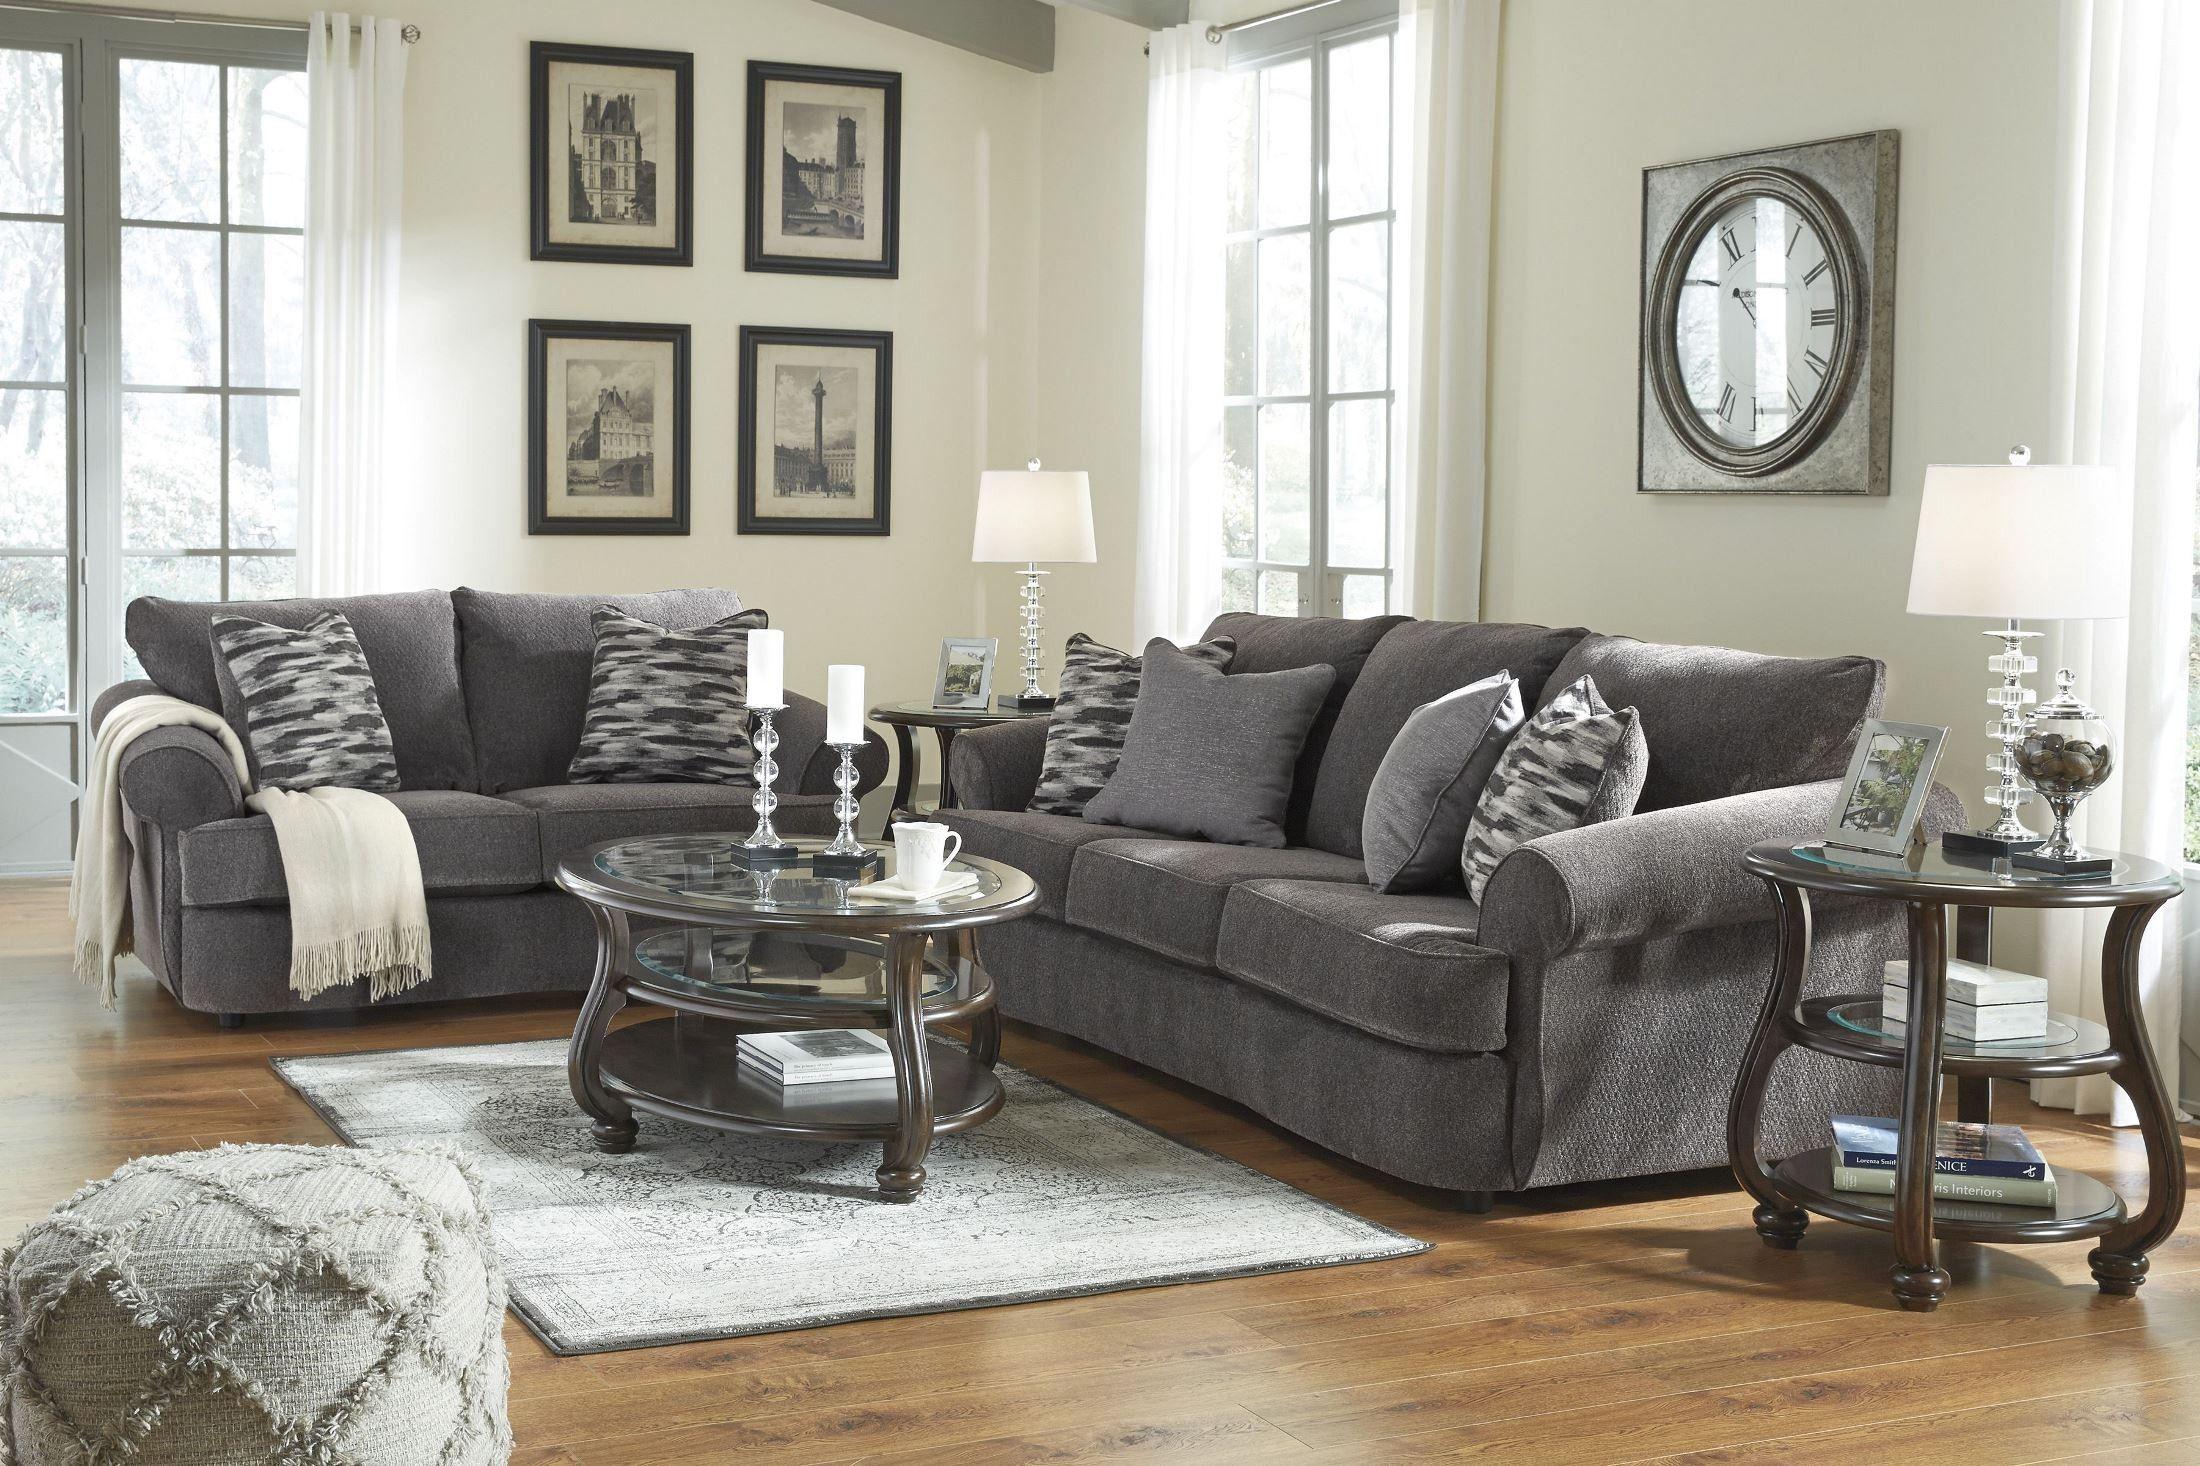 Allouette Ash Living Room Set   Cheap living room sets ...